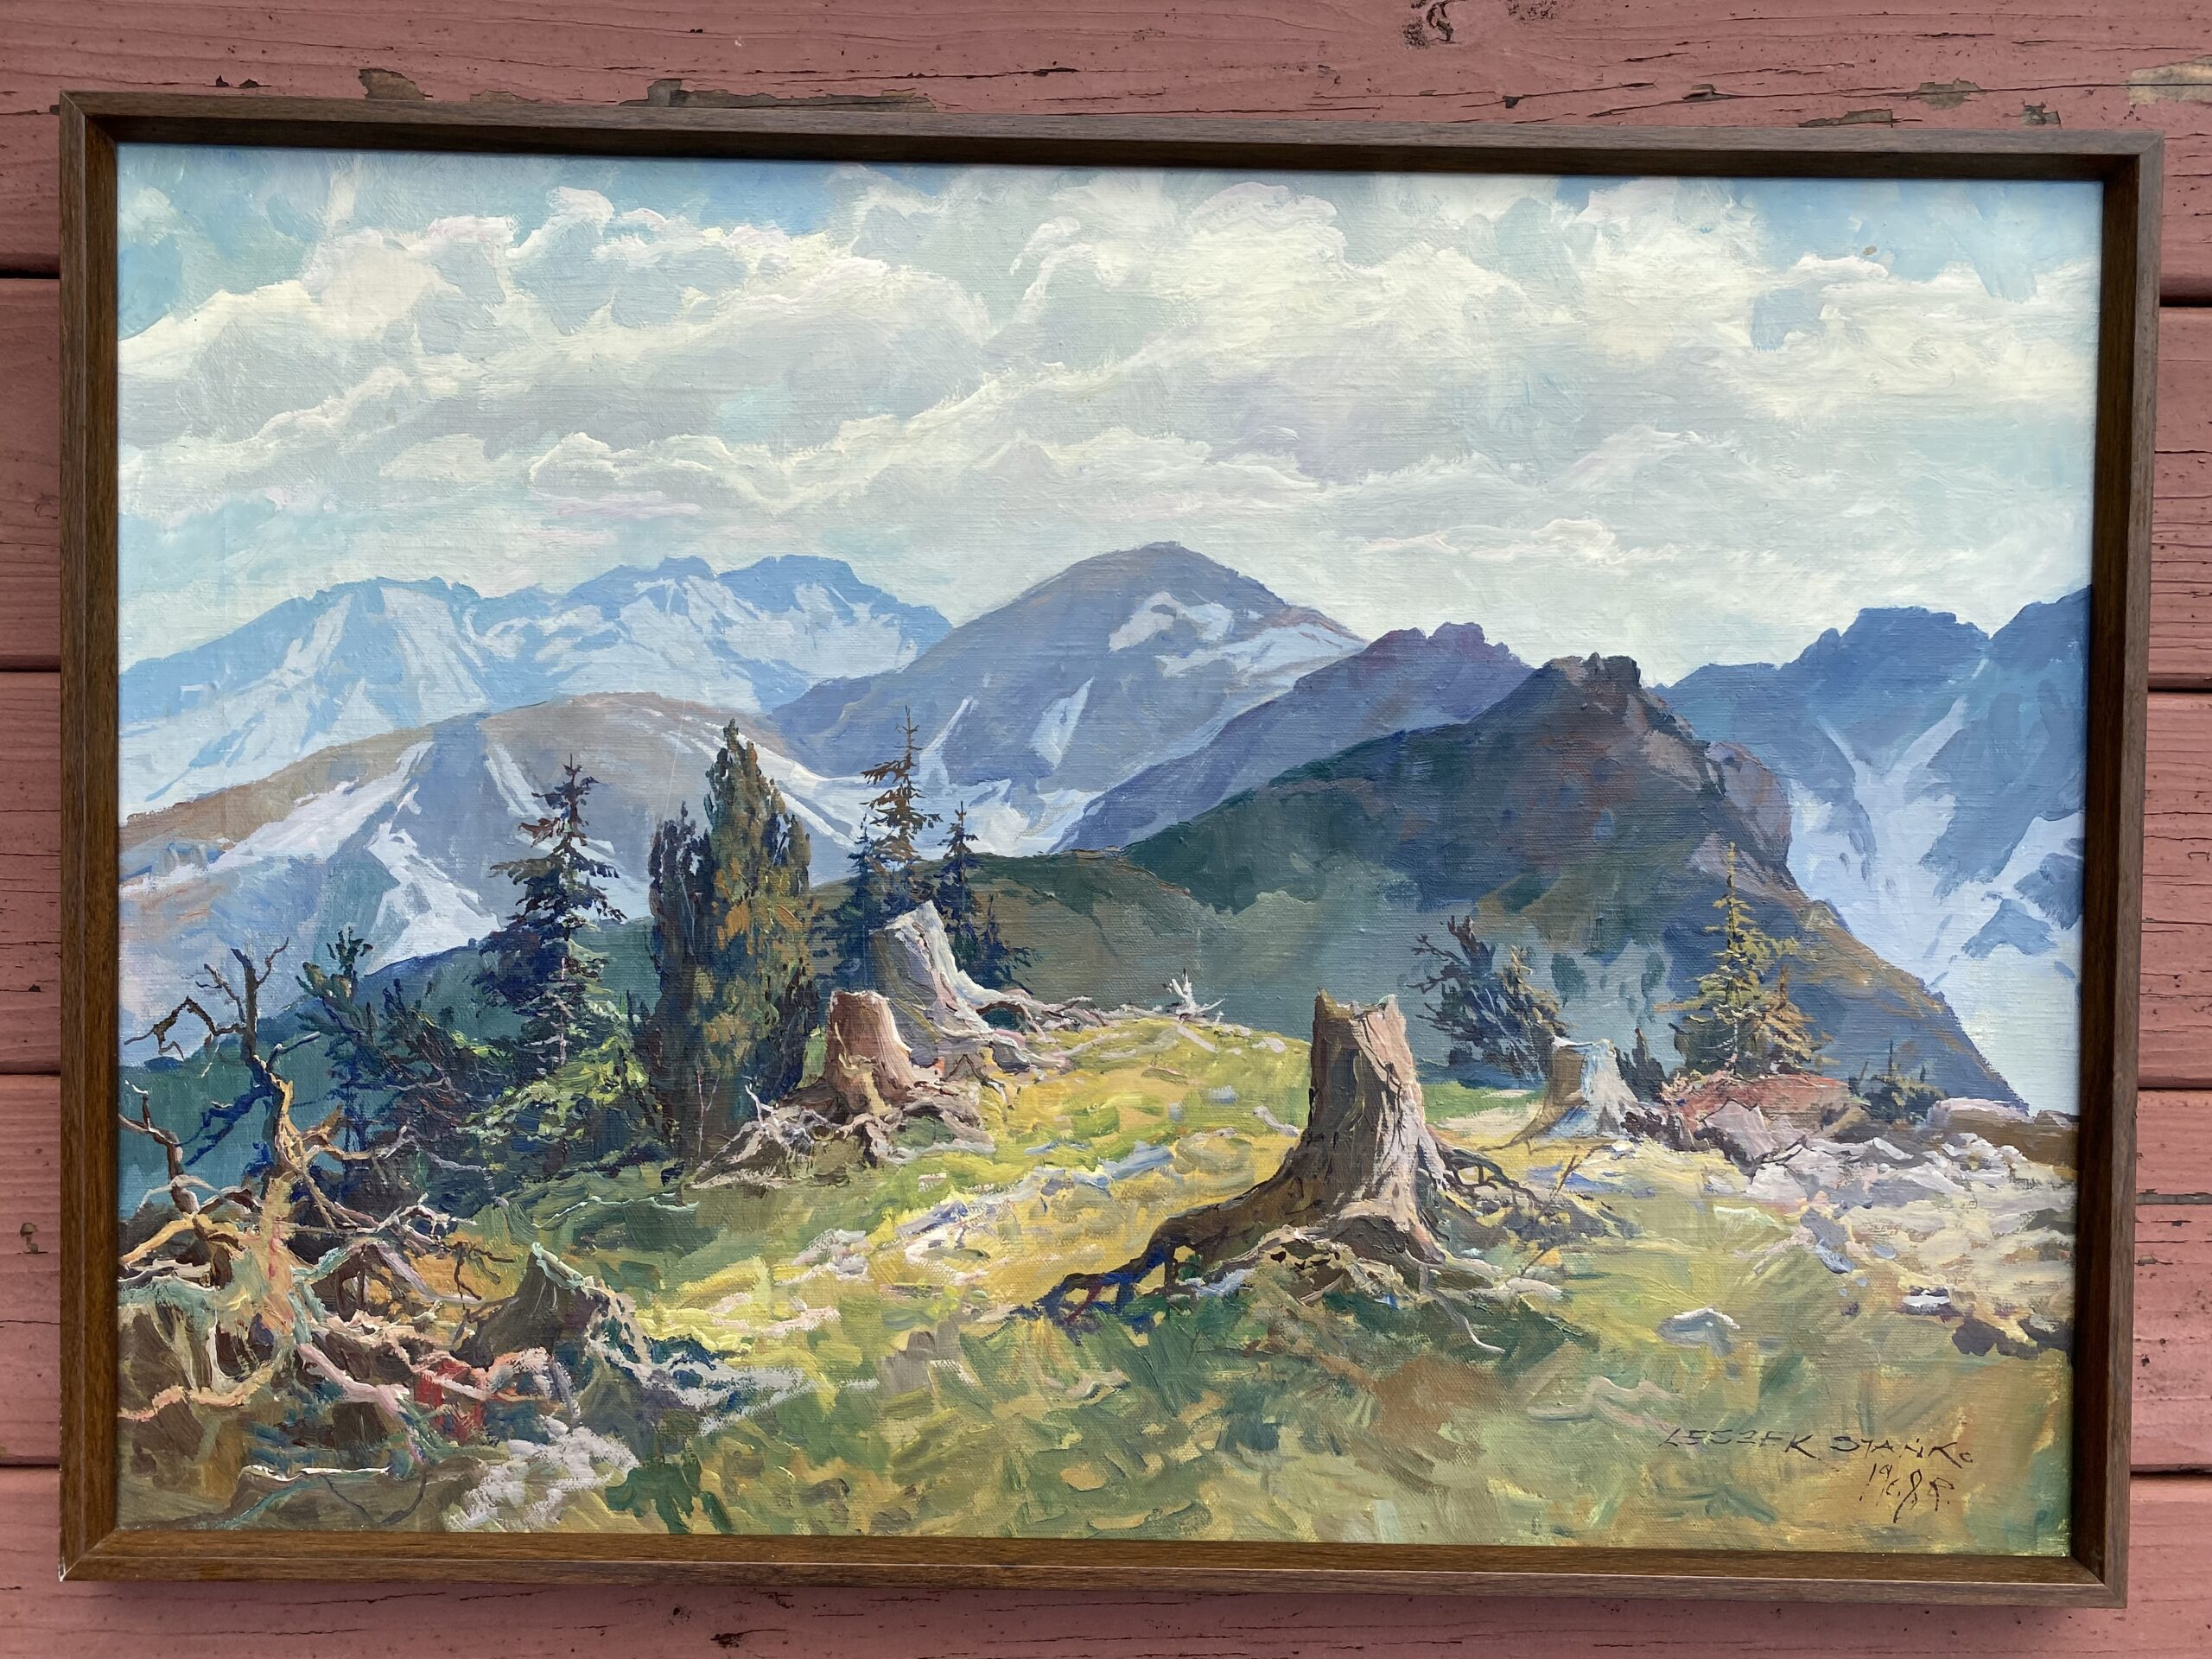 "Leszek Stanko (1925-2011) Signed Landscape with Mountains 1968 Oil on Canvas. Framed measurement 20.5"" x 28"" ~ $185.00"